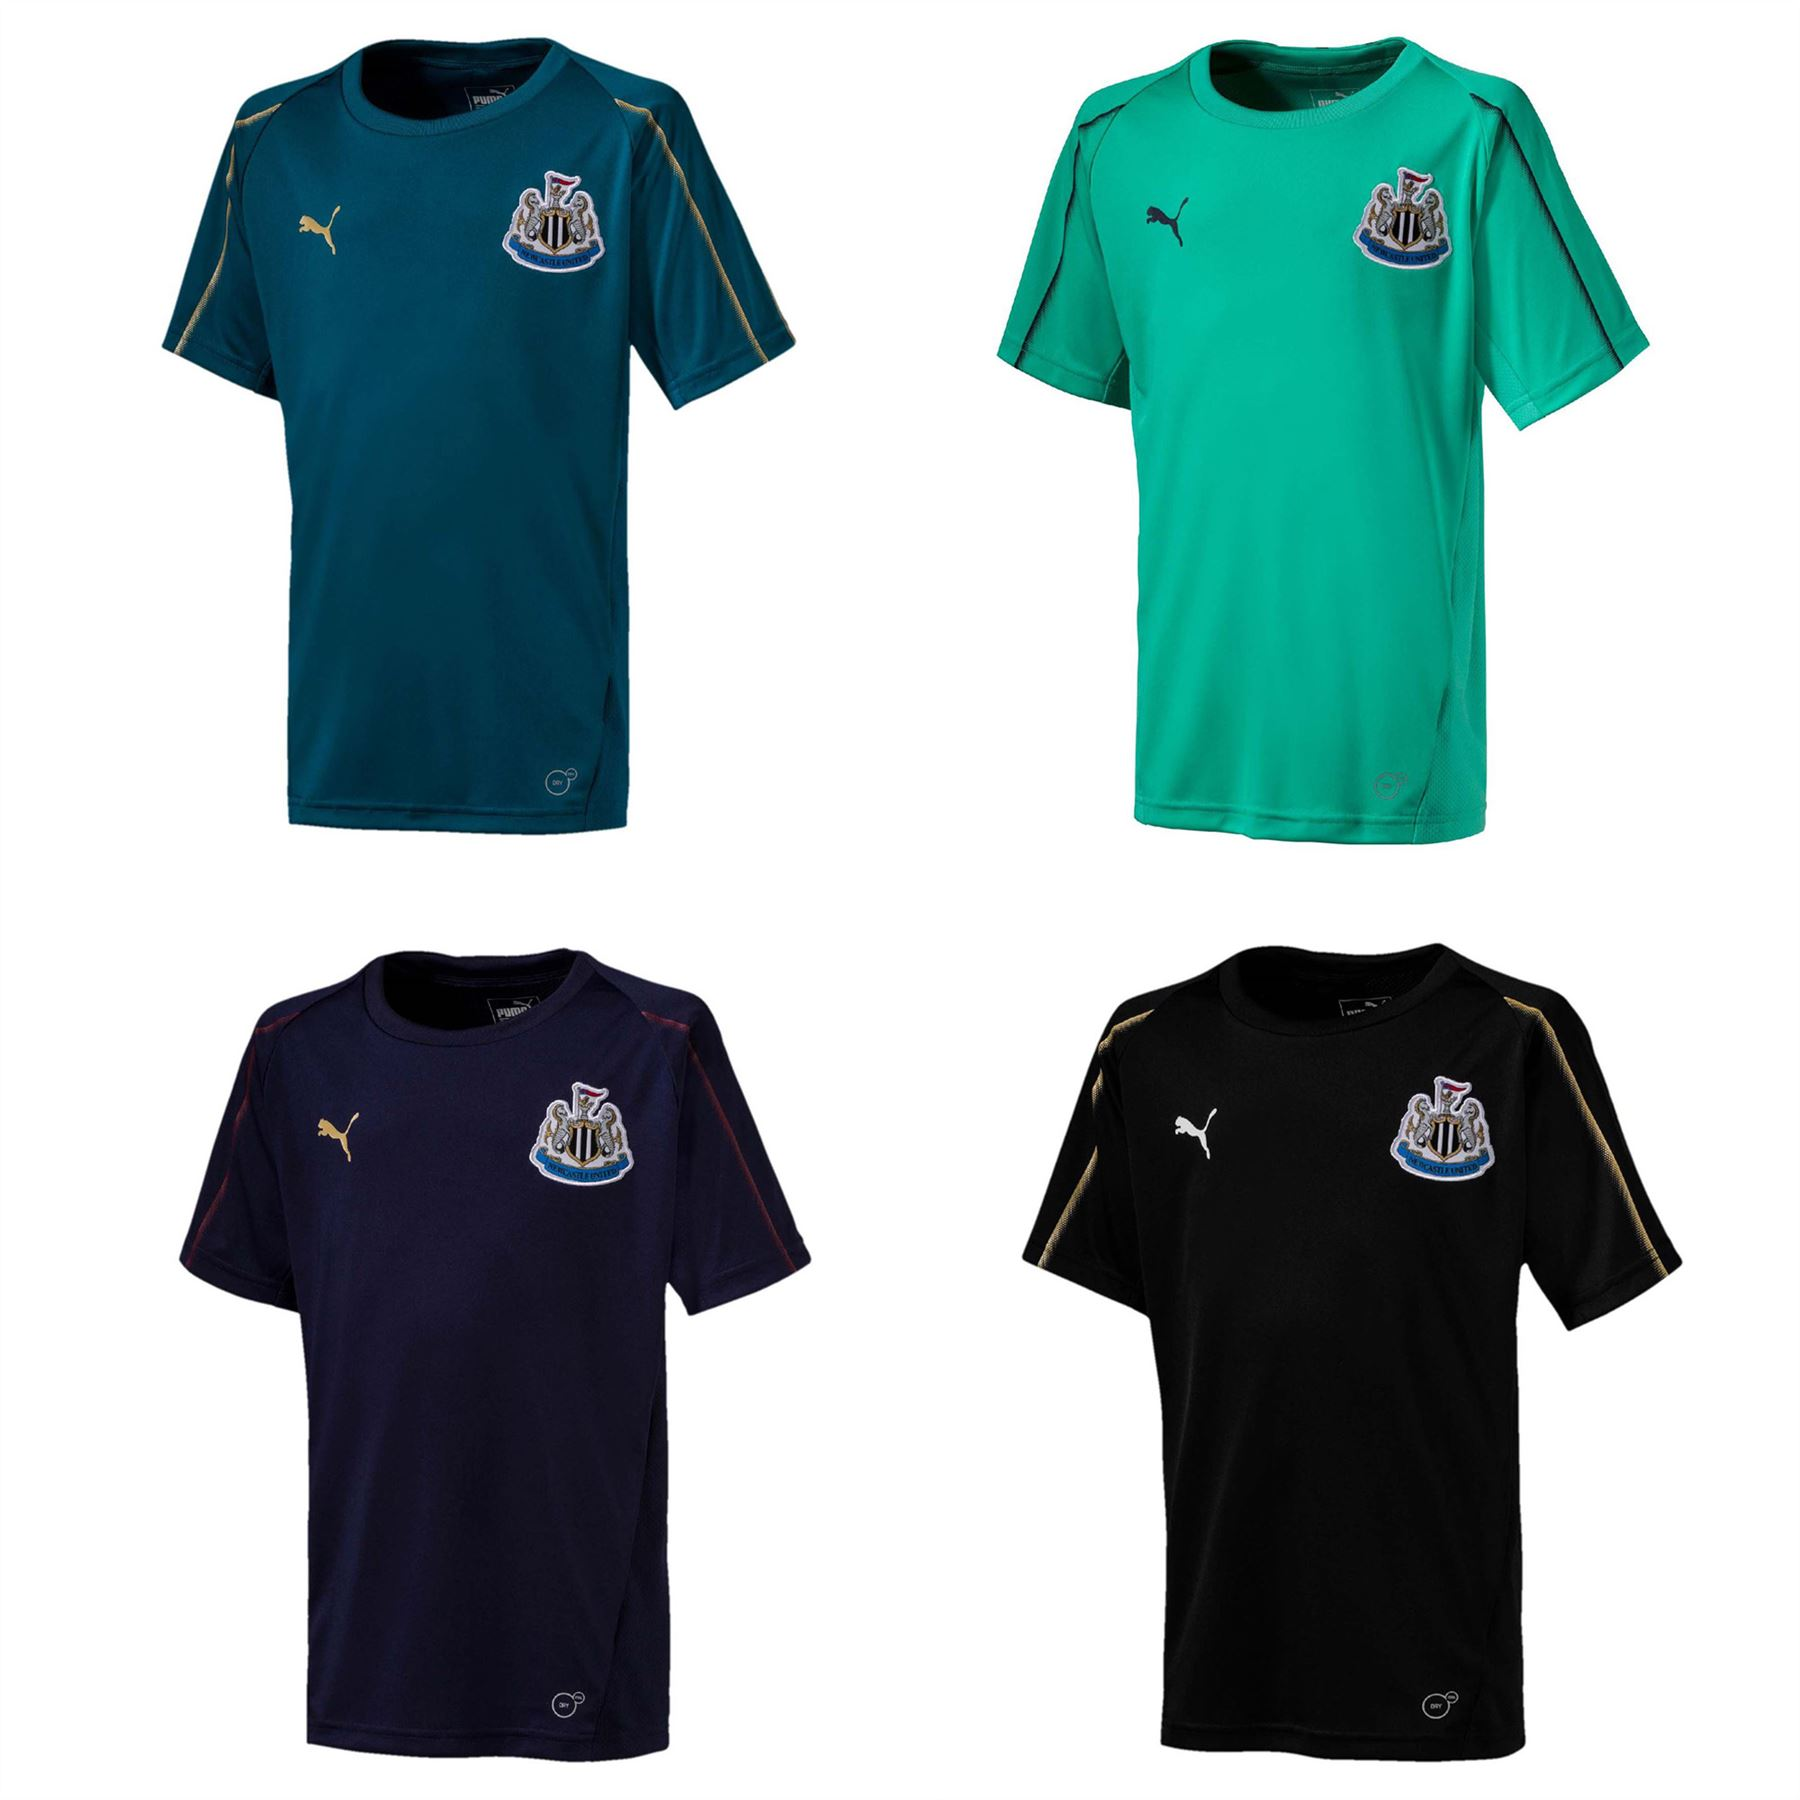 7c35dda42 Details about Puma Newcastle United Training Jersey 2018 2019 Football  Soccer Fan Top Shirt